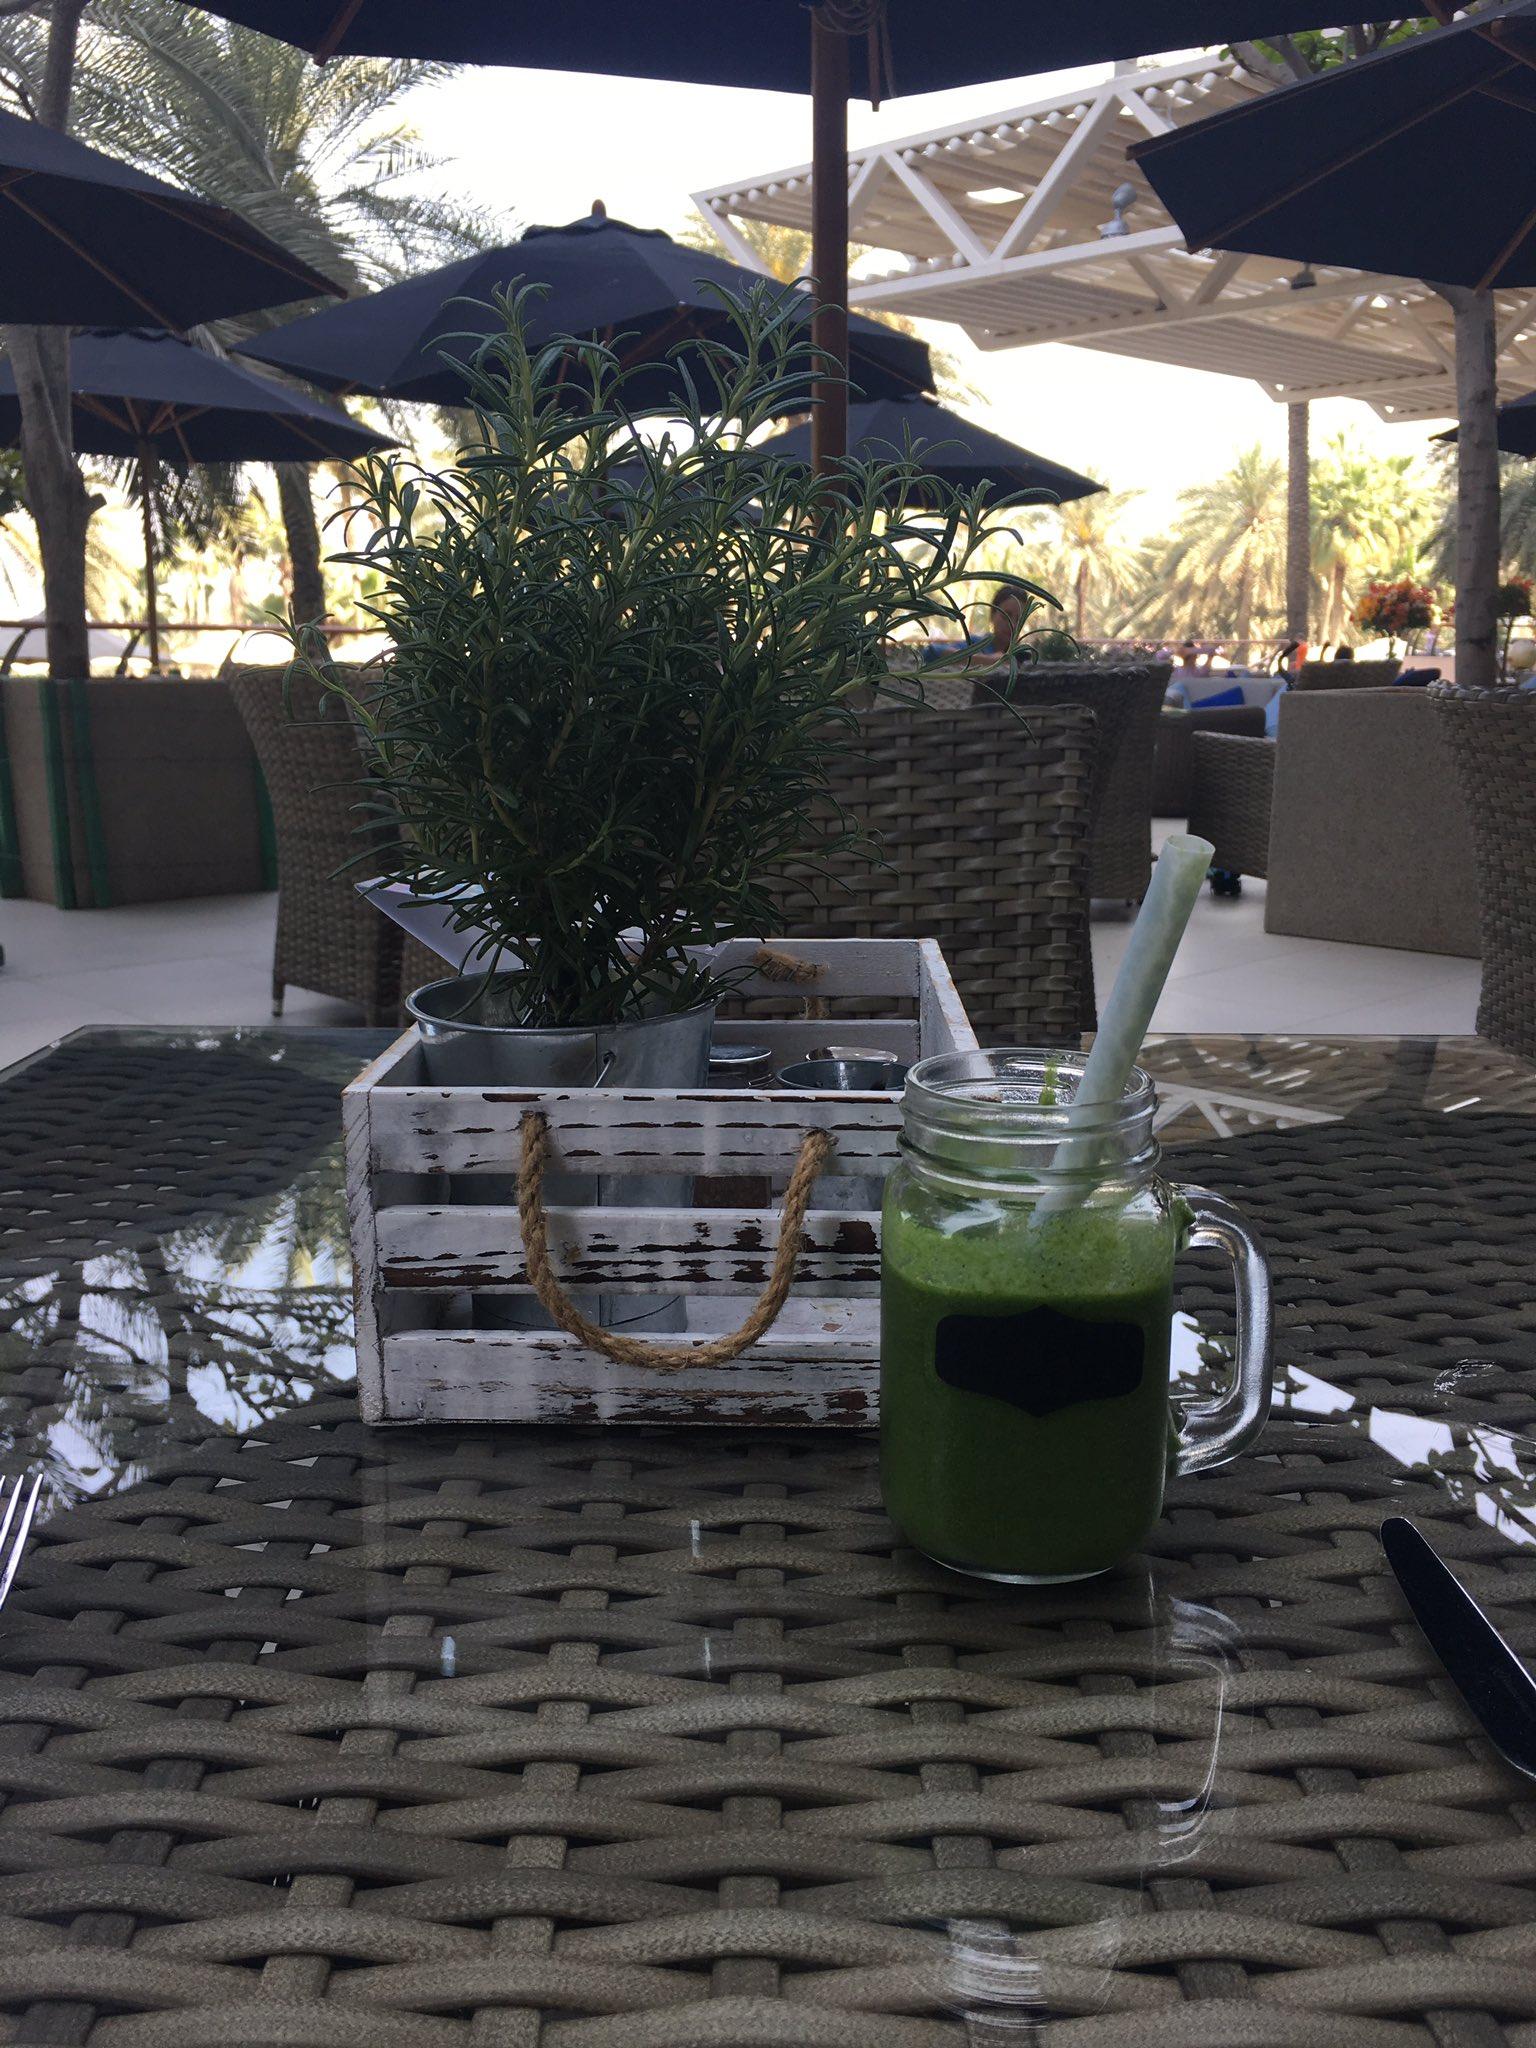 Juice life in #Dubai .... #notforlong https://t.co/tfHndTAsLv